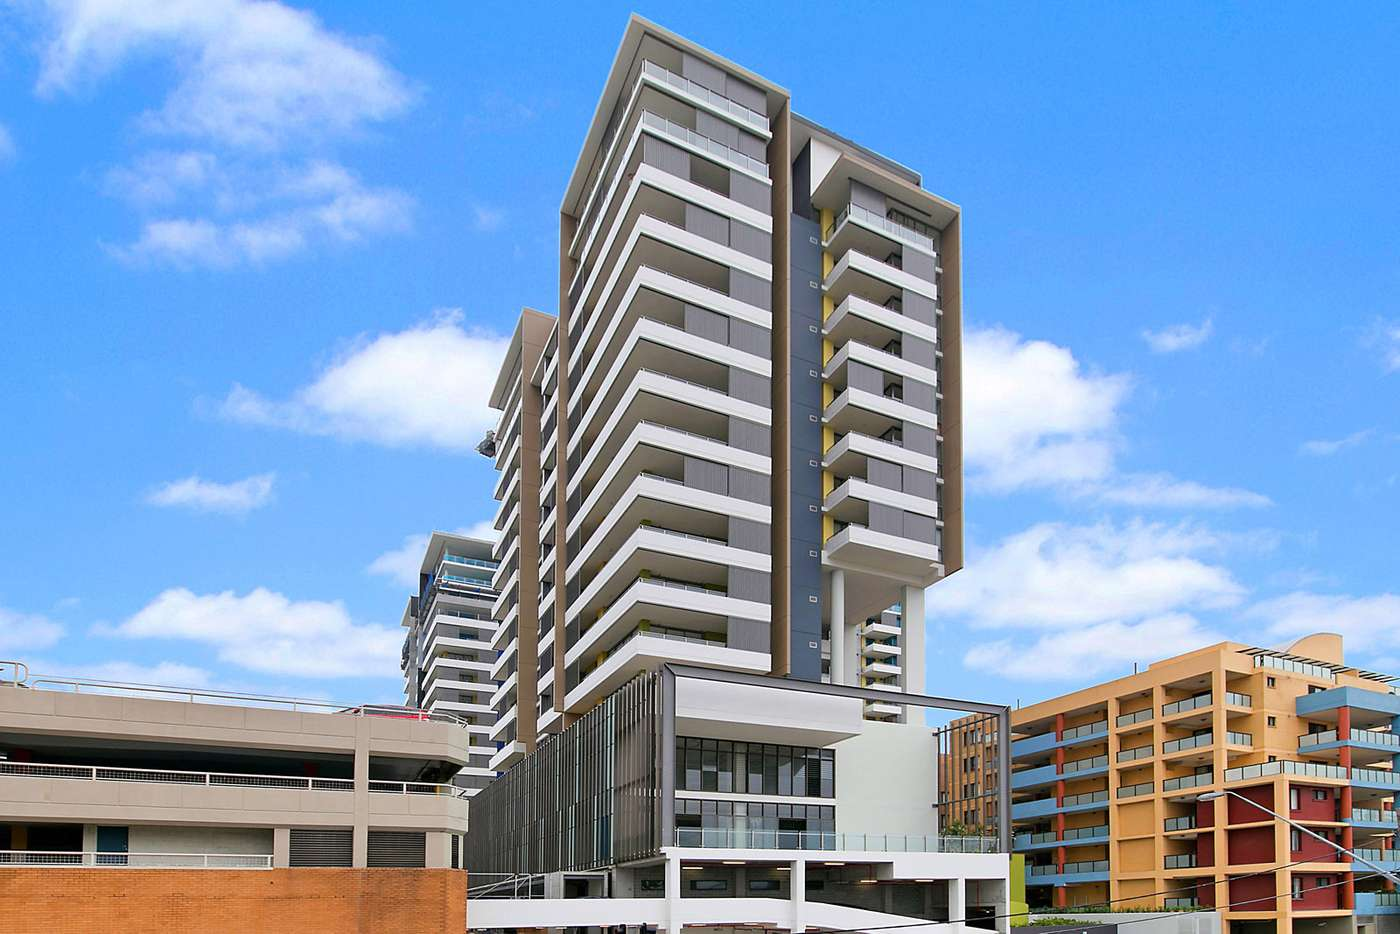 Main view of Homely unit listing, C803/8 Wynne Avenue, Burwood, NSW 2134